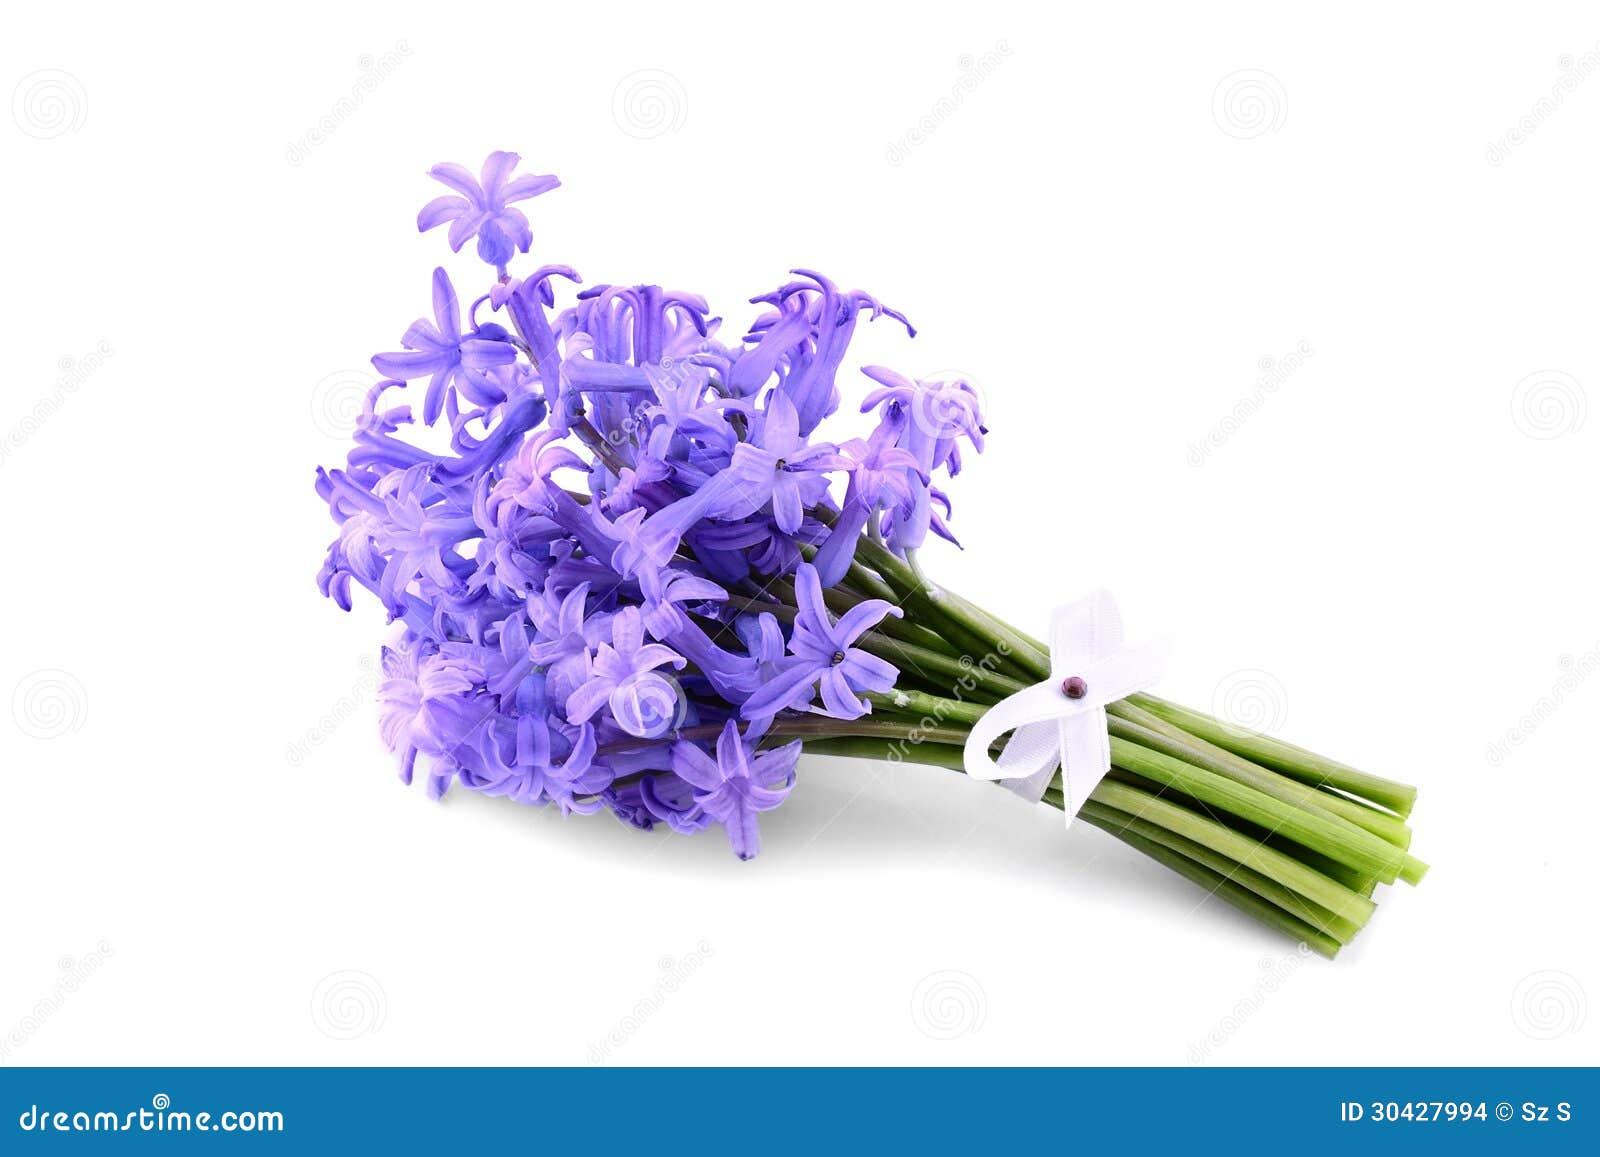 Bouquet violet hyacinth stock photos images pictures 1561 hyacinth bouquet stock images dhlflorist Choice Image